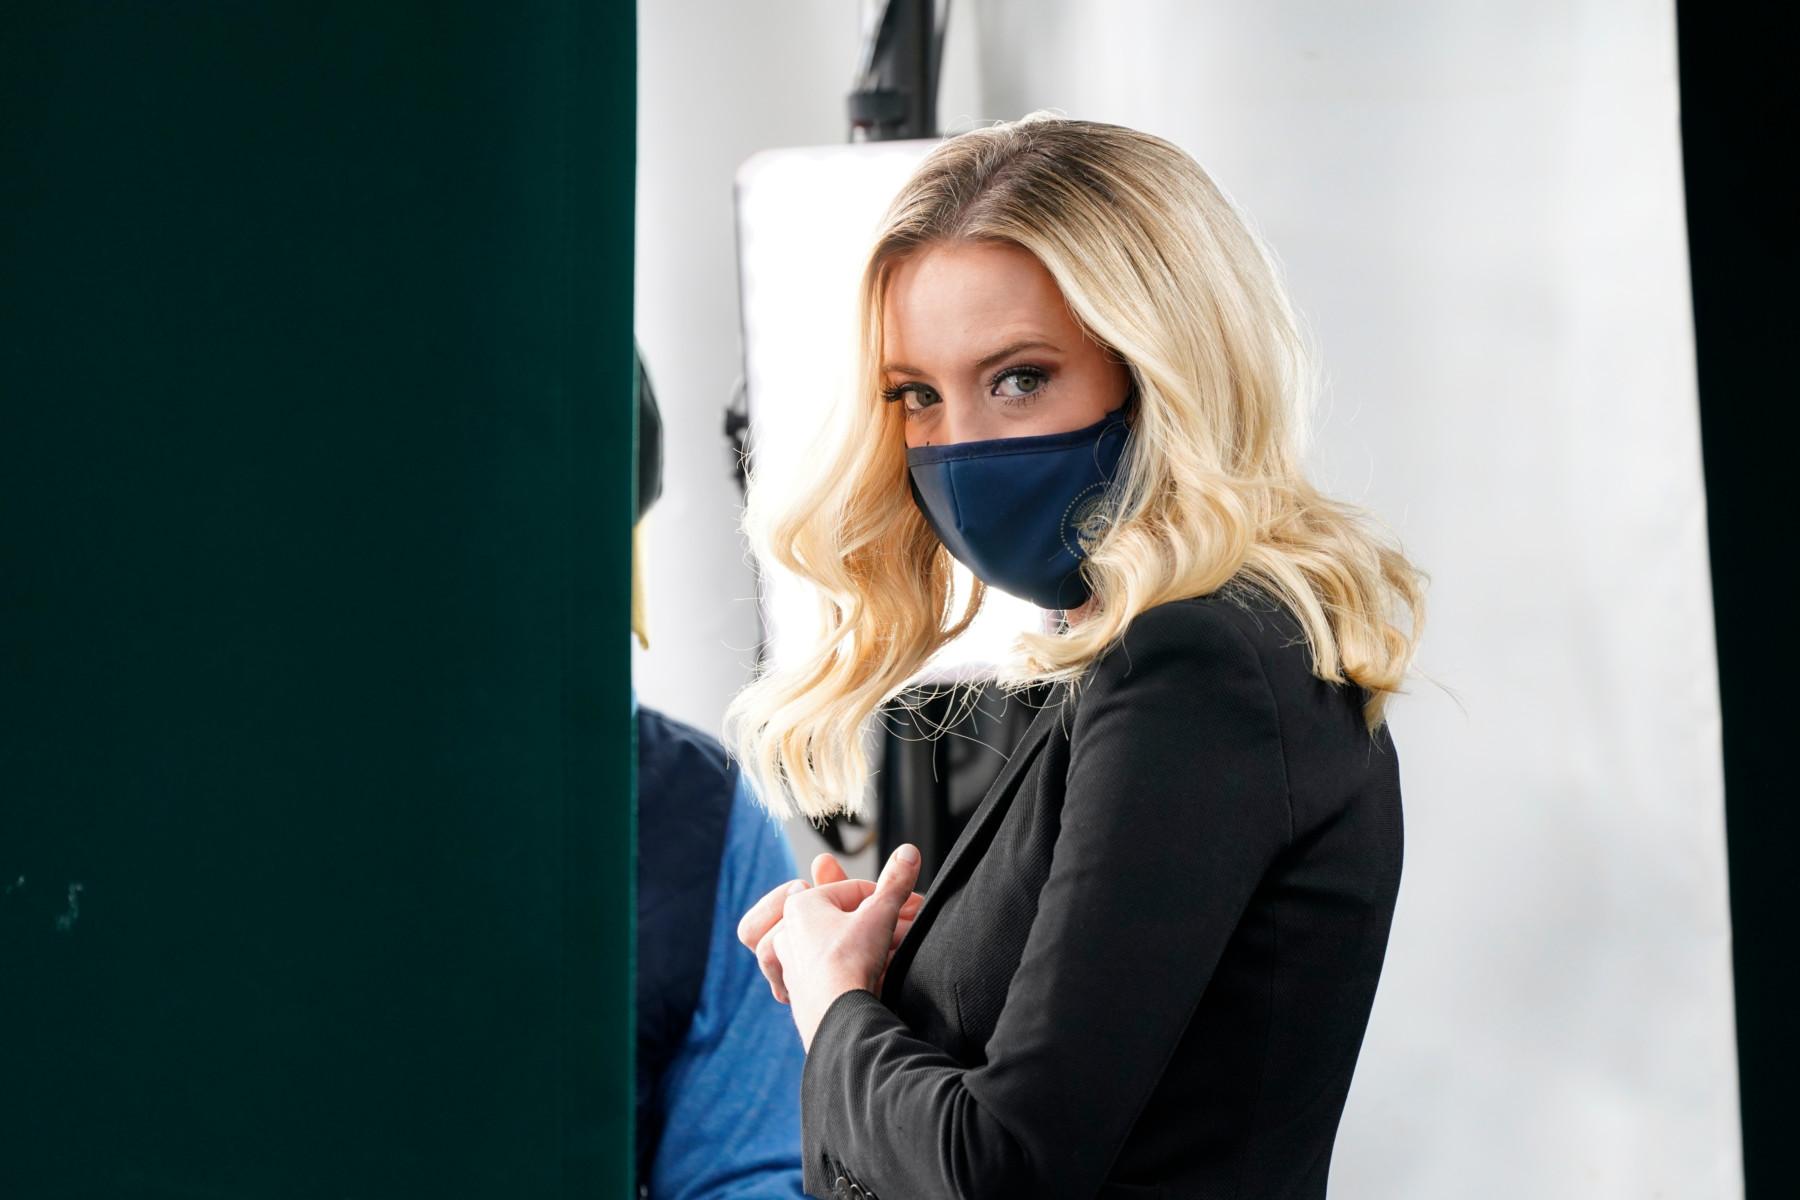 White House Press Secretary Kayleigh McEnany says she's tested positive for coronavirus